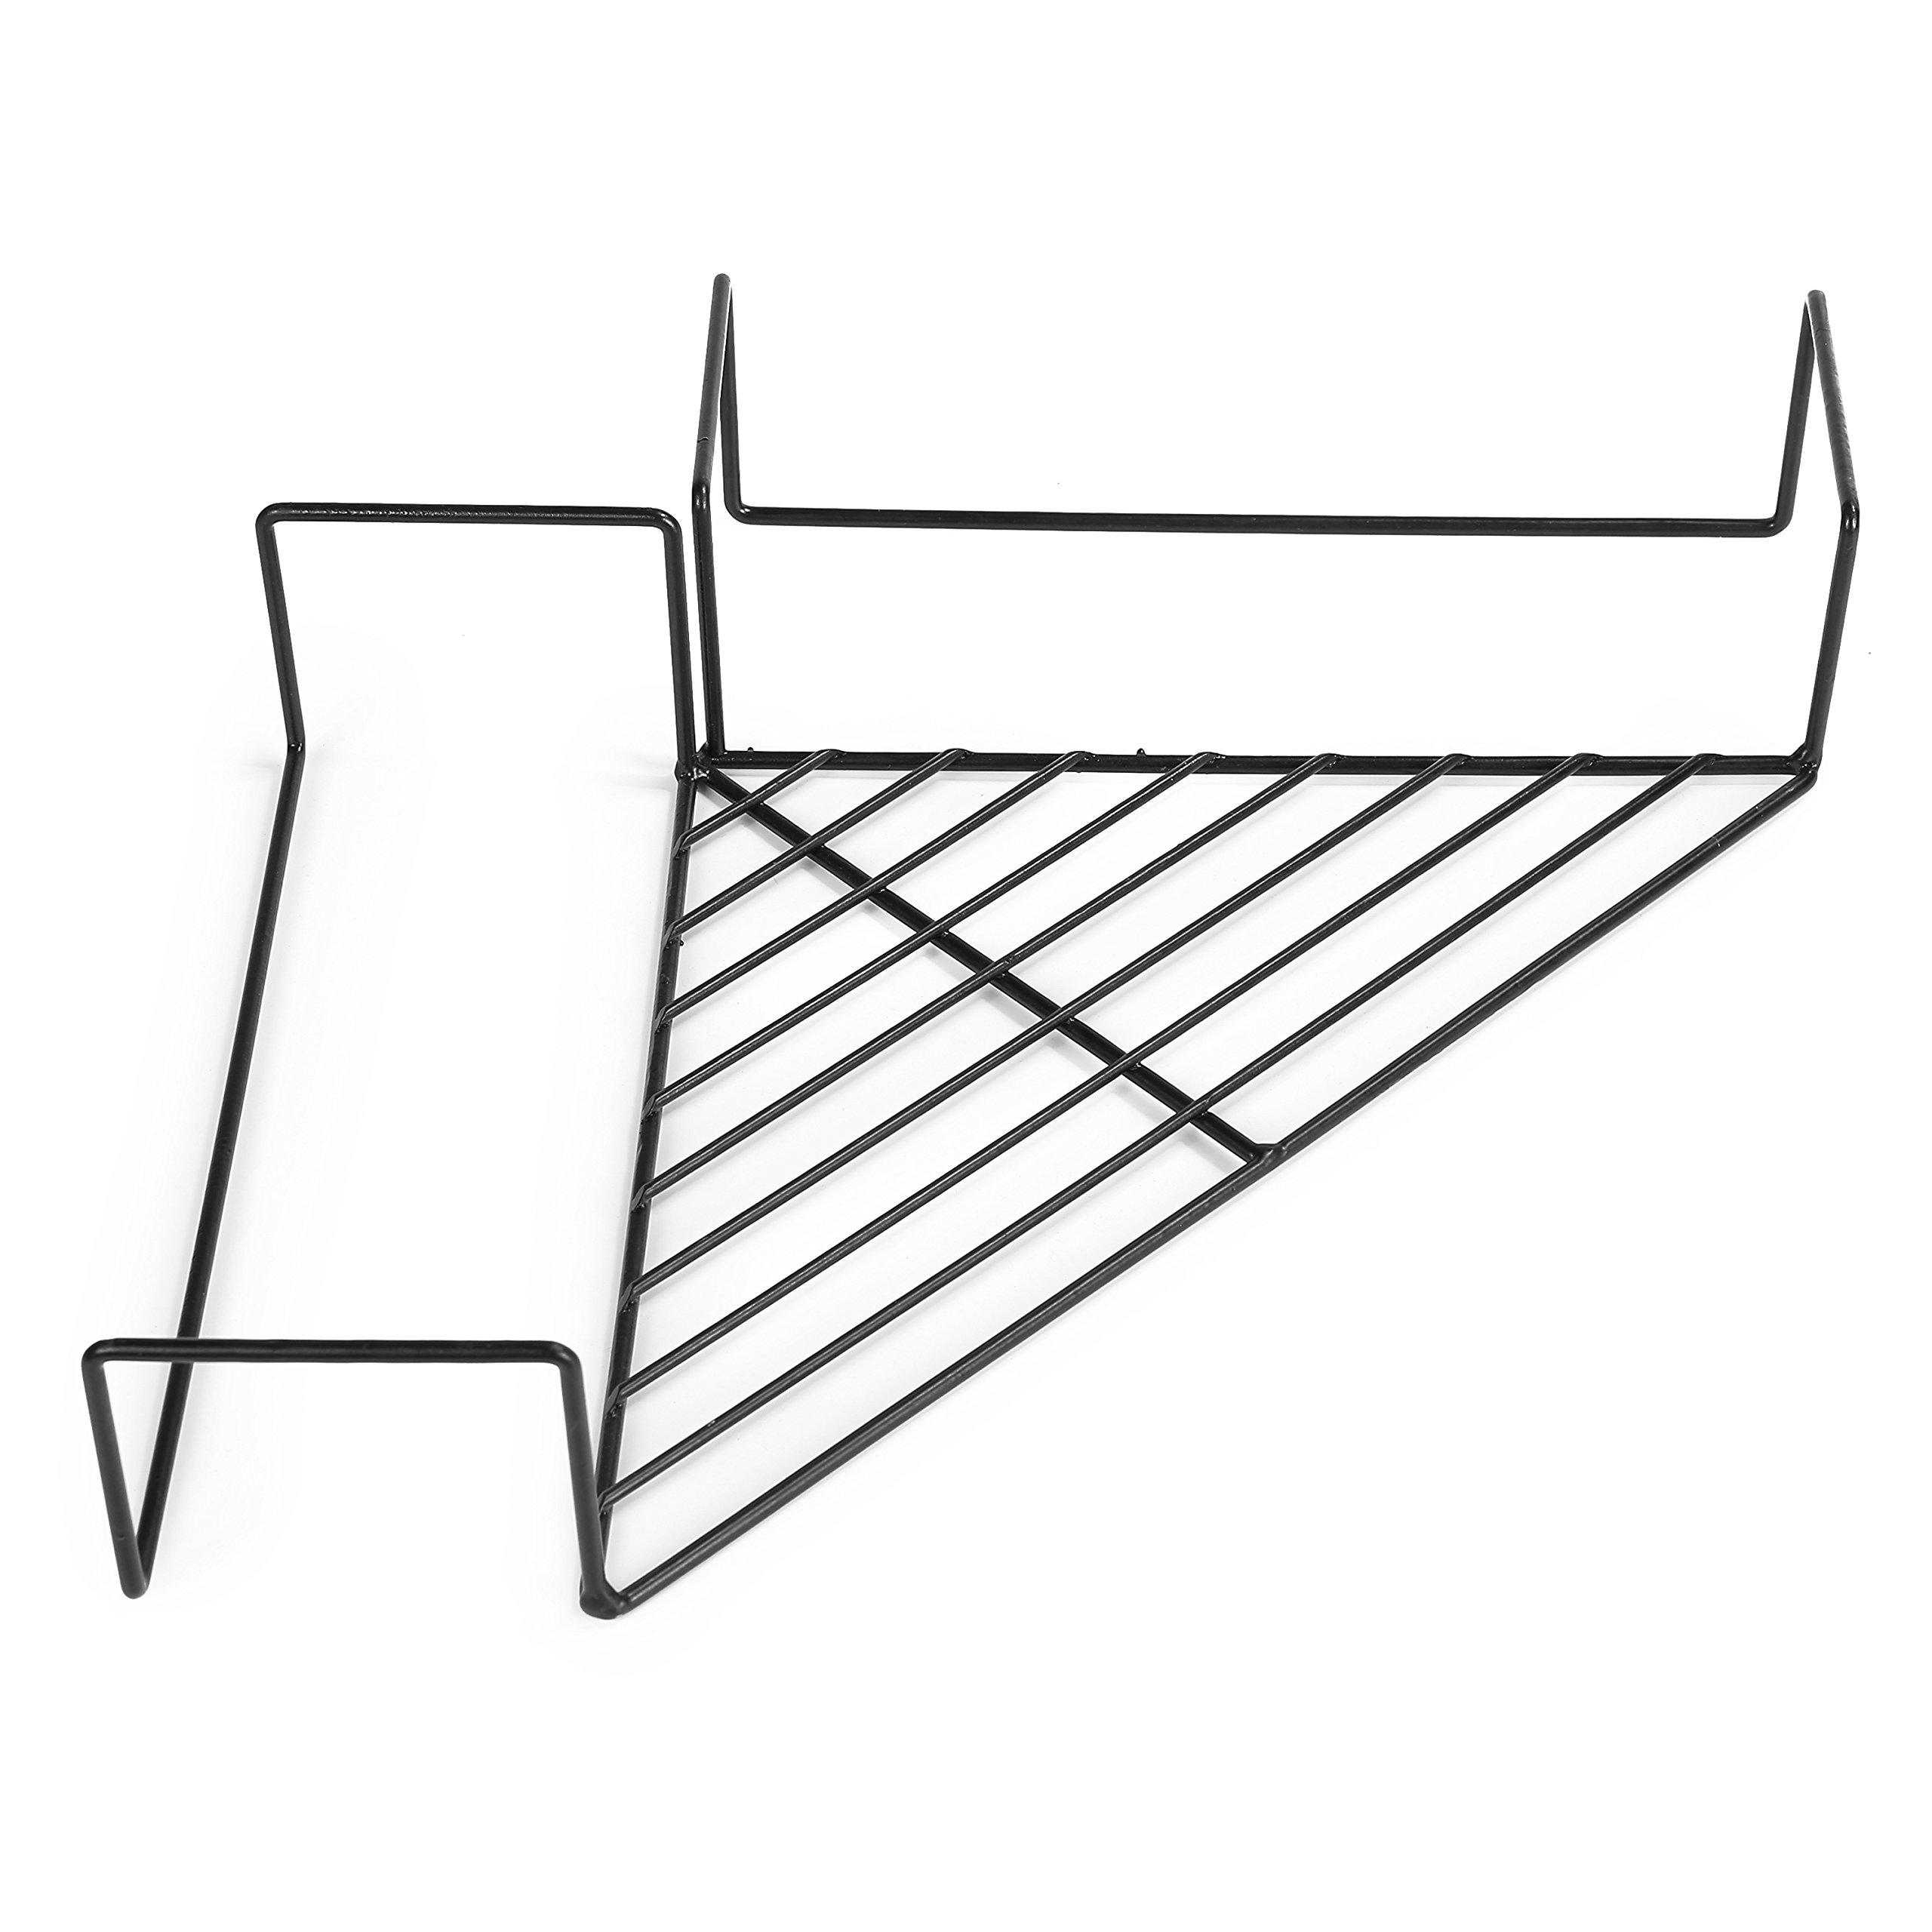 MyGift Metal Cubicle Corner Floating Shelf Organizer Rack, Black